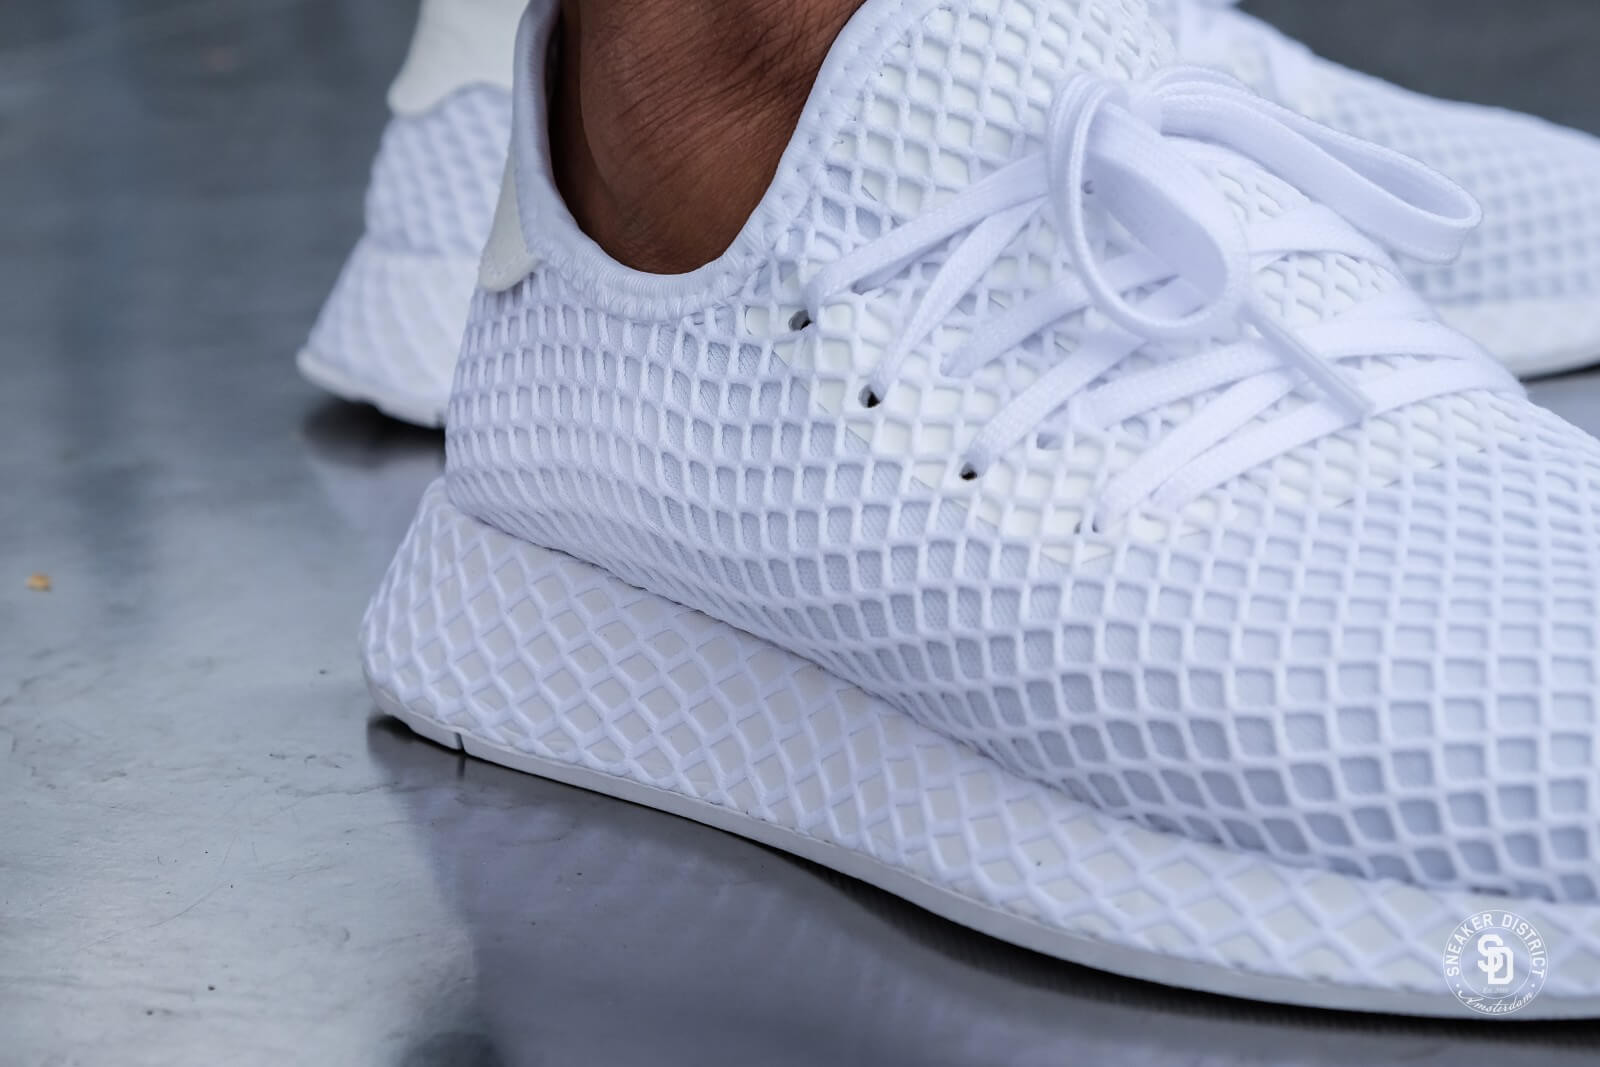 Avis] Adidas Deerupt Runner Grid blanche Triple White ...